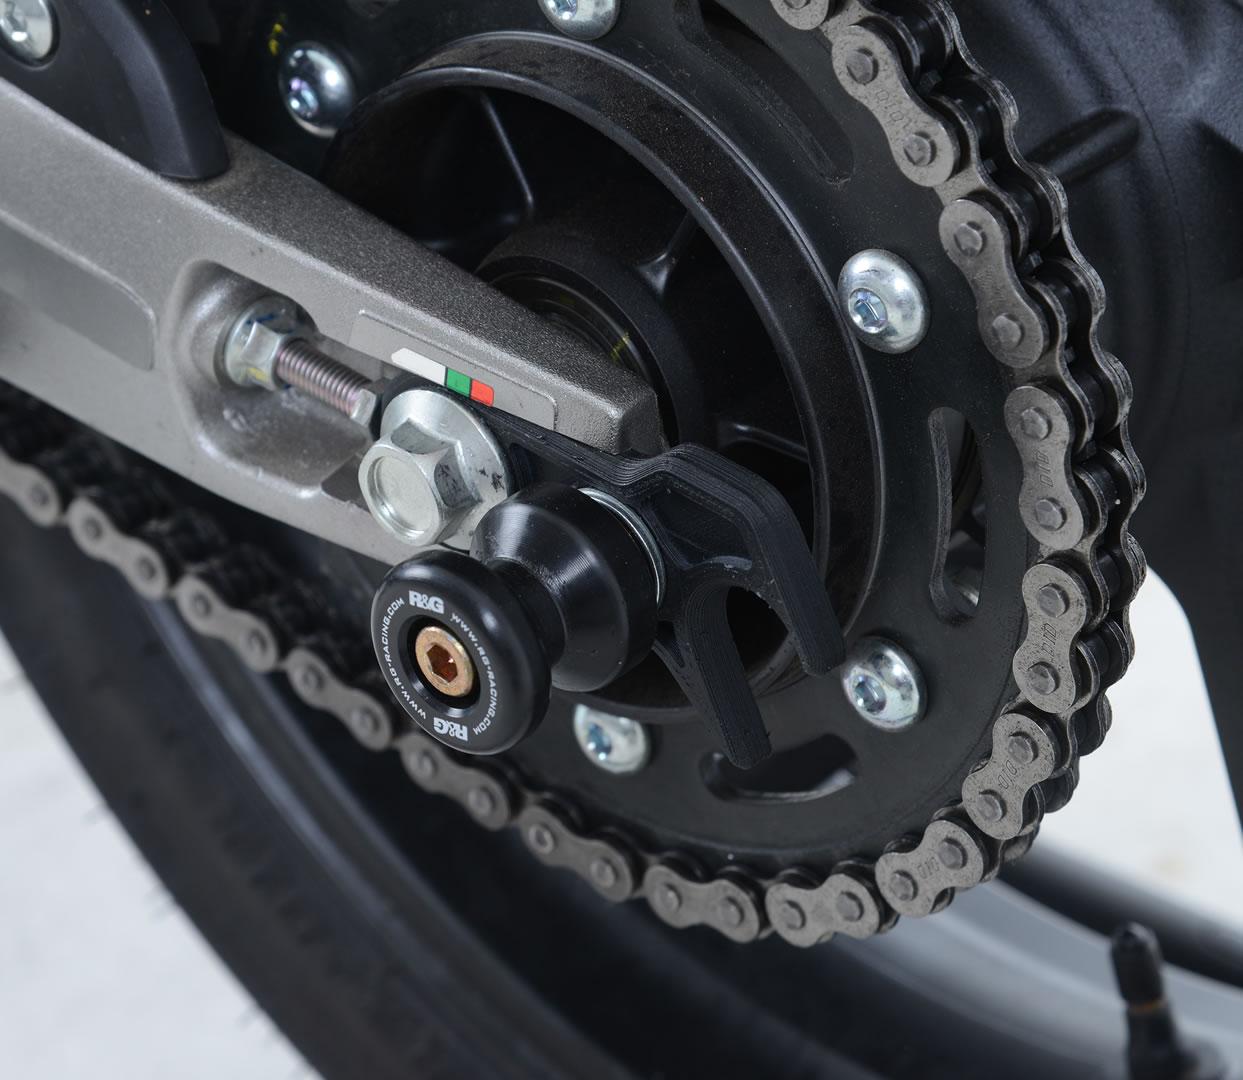 2018 R/&G Racing black swingarm protectors for Suzuki GSX-S125